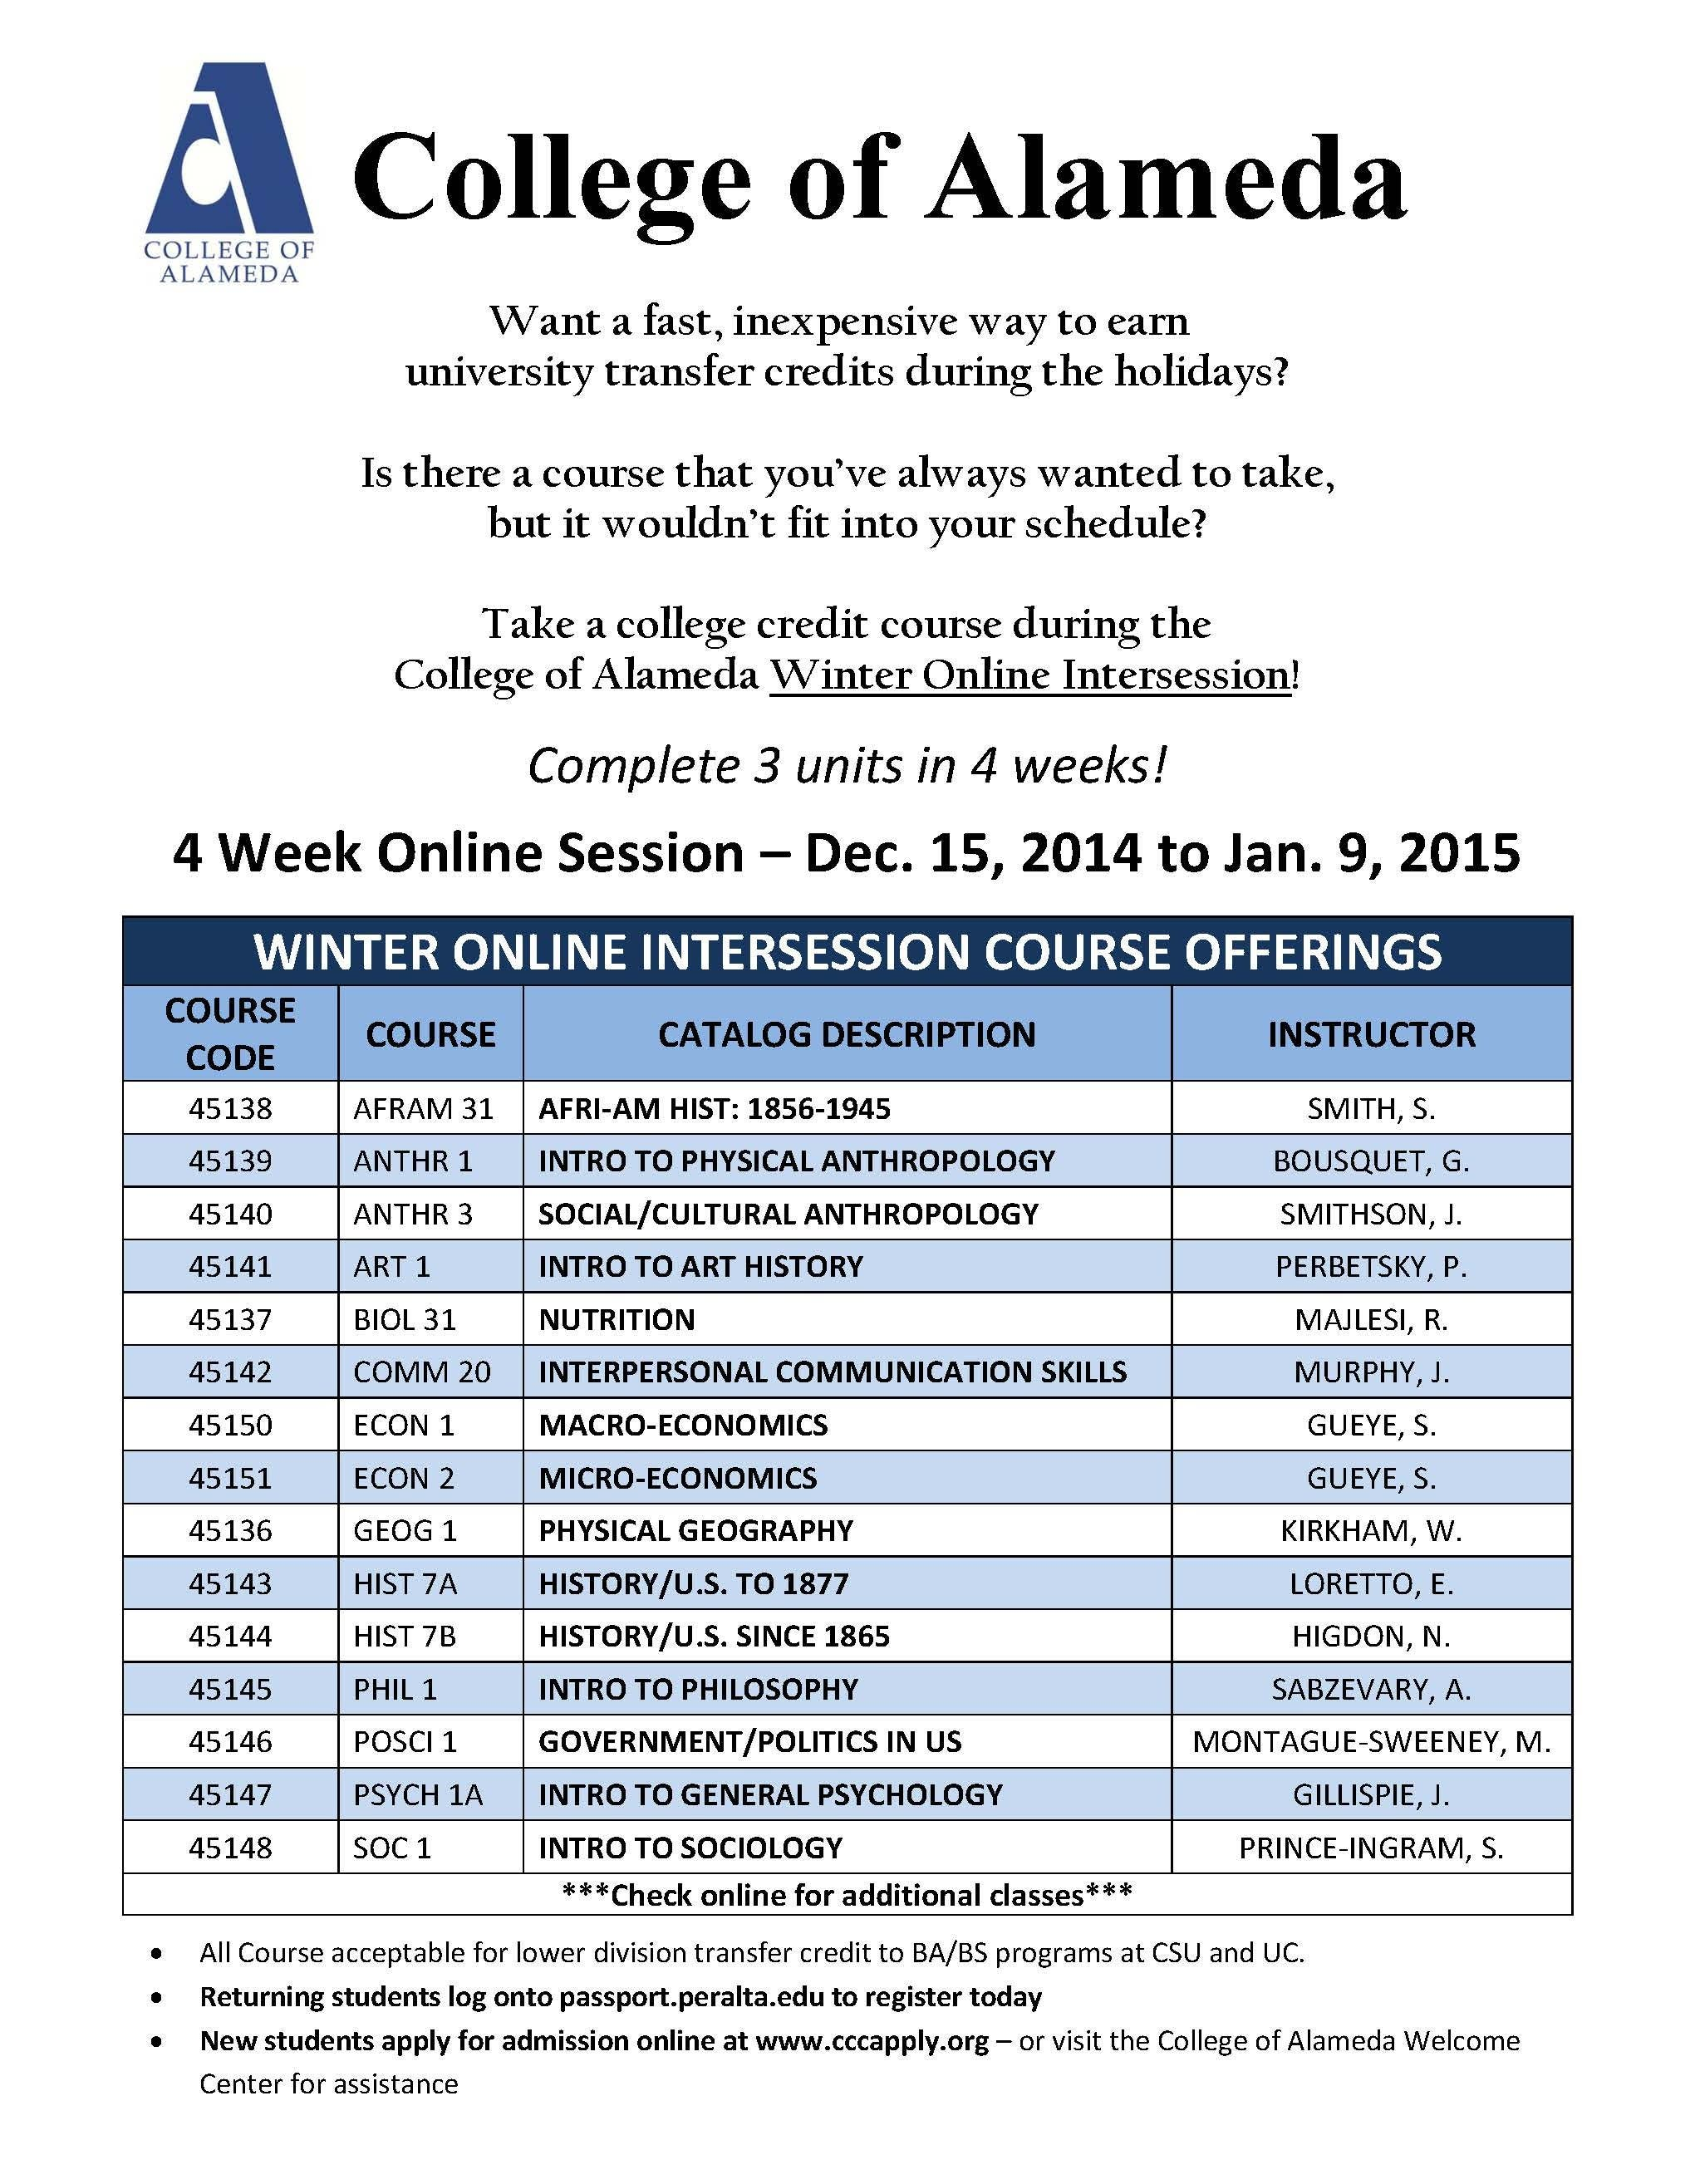 College of Alameda 4 Week Winter Online Session! Enroll